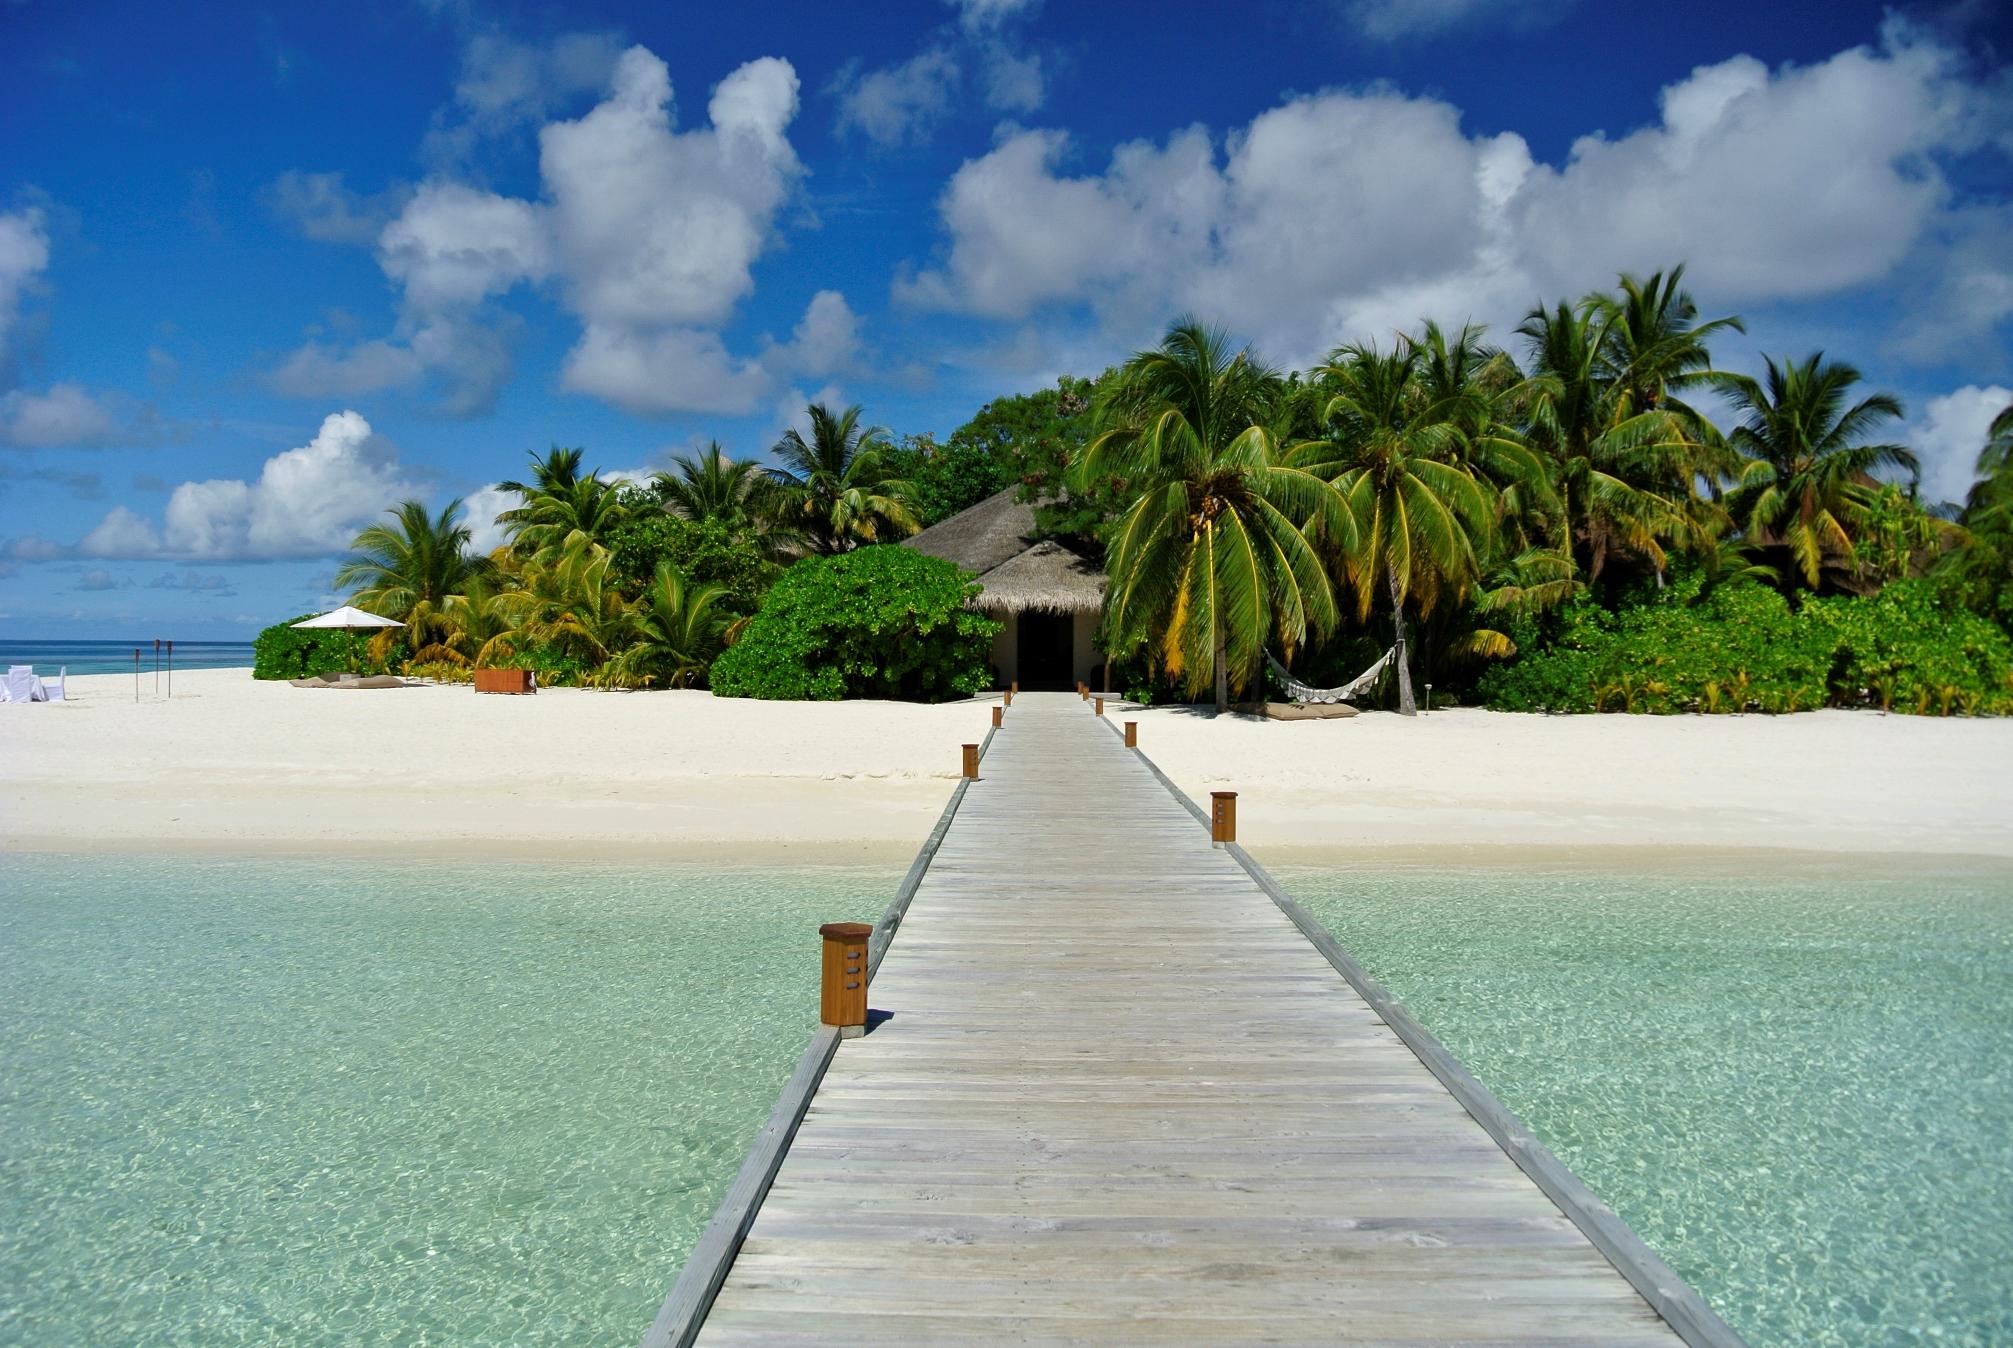 mirihi island resort malediven reisebericht fotos reiseblog. Black Bedroom Furniture Sets. Home Design Ideas